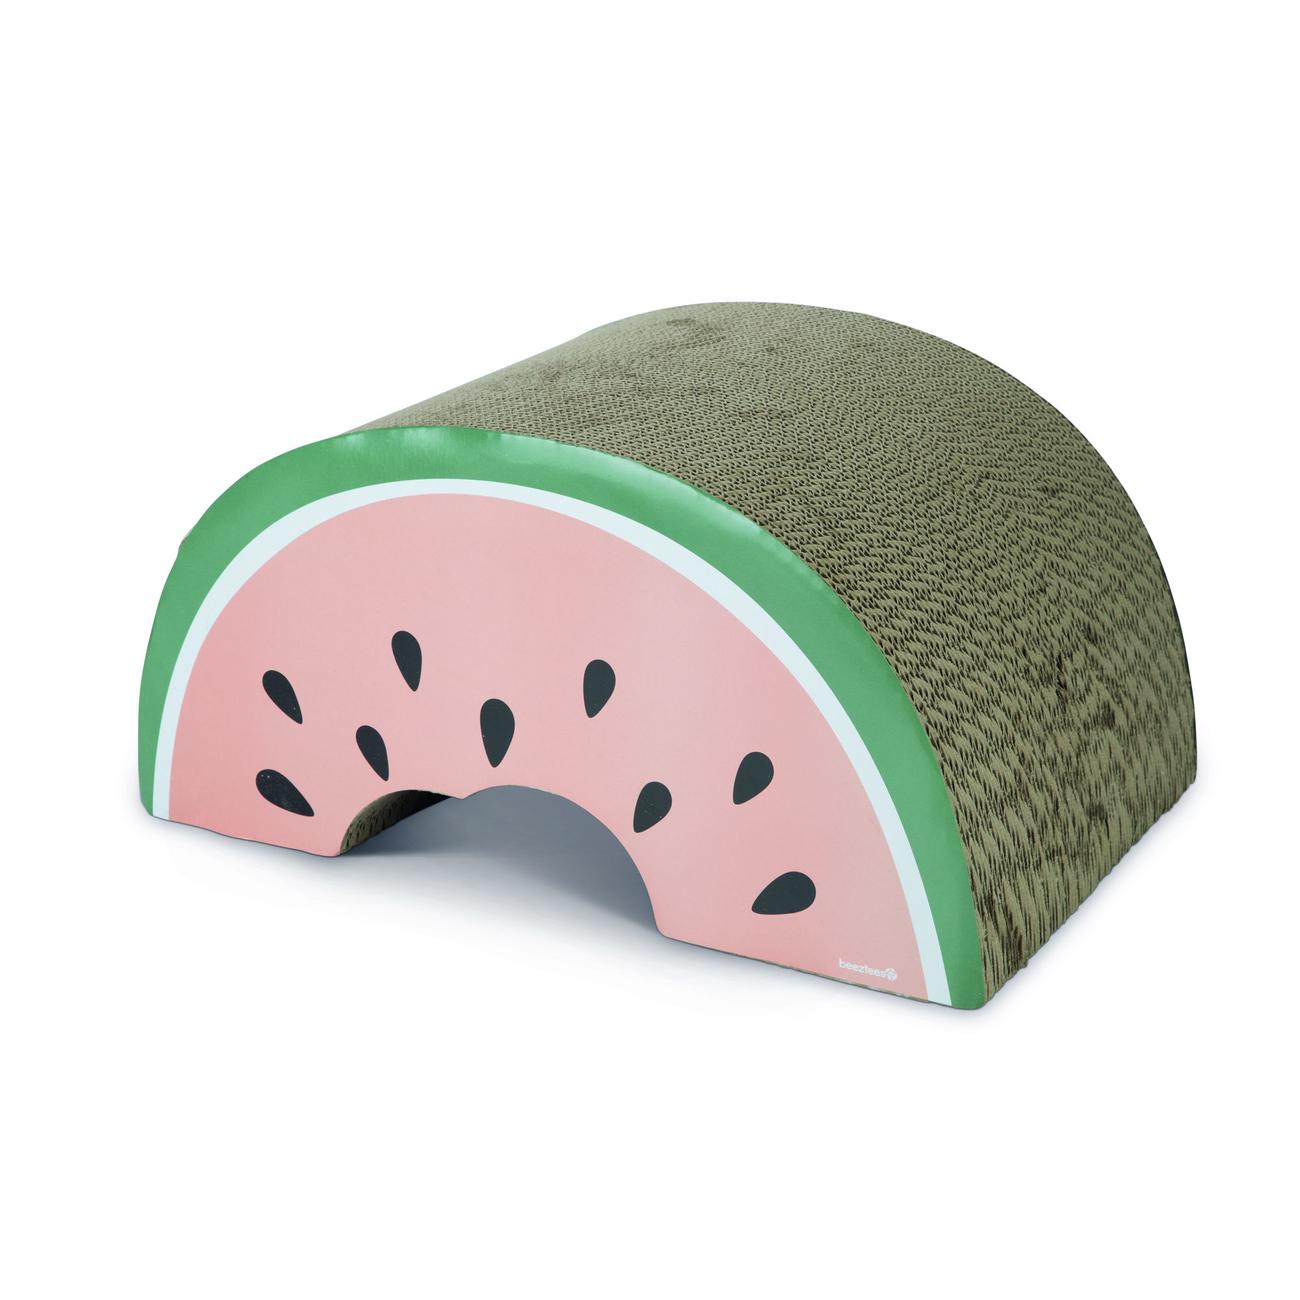 Beeztees Kratzspielzeug Wellpappe Karton Melone